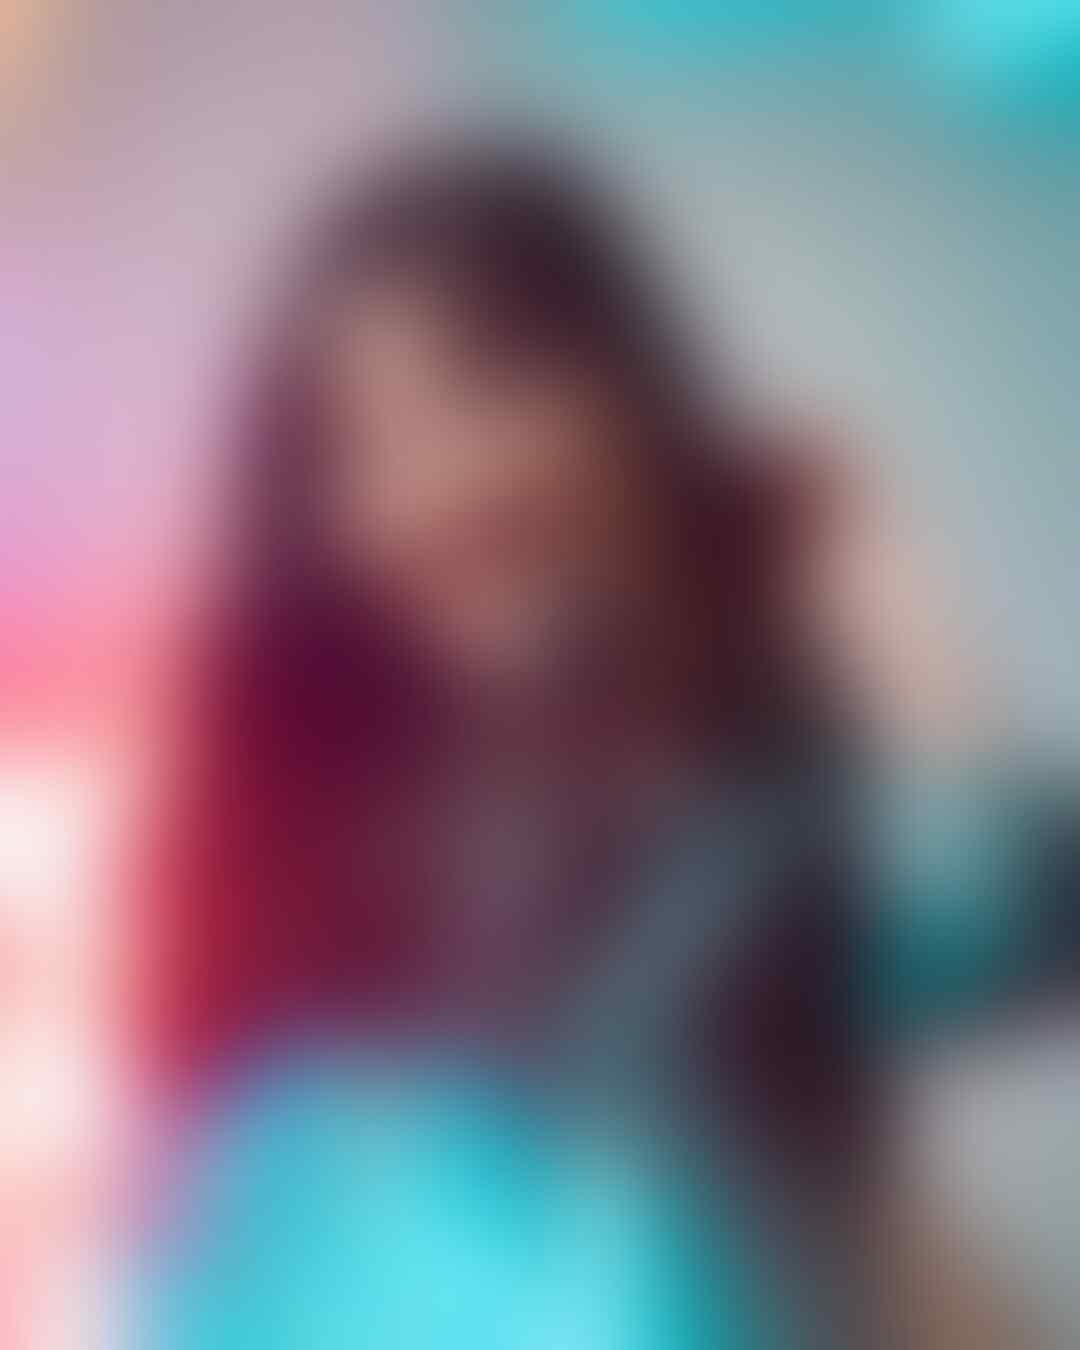 10 Potret Manis Misellia Ikwan, Penyanyi Muda Idola Remaja